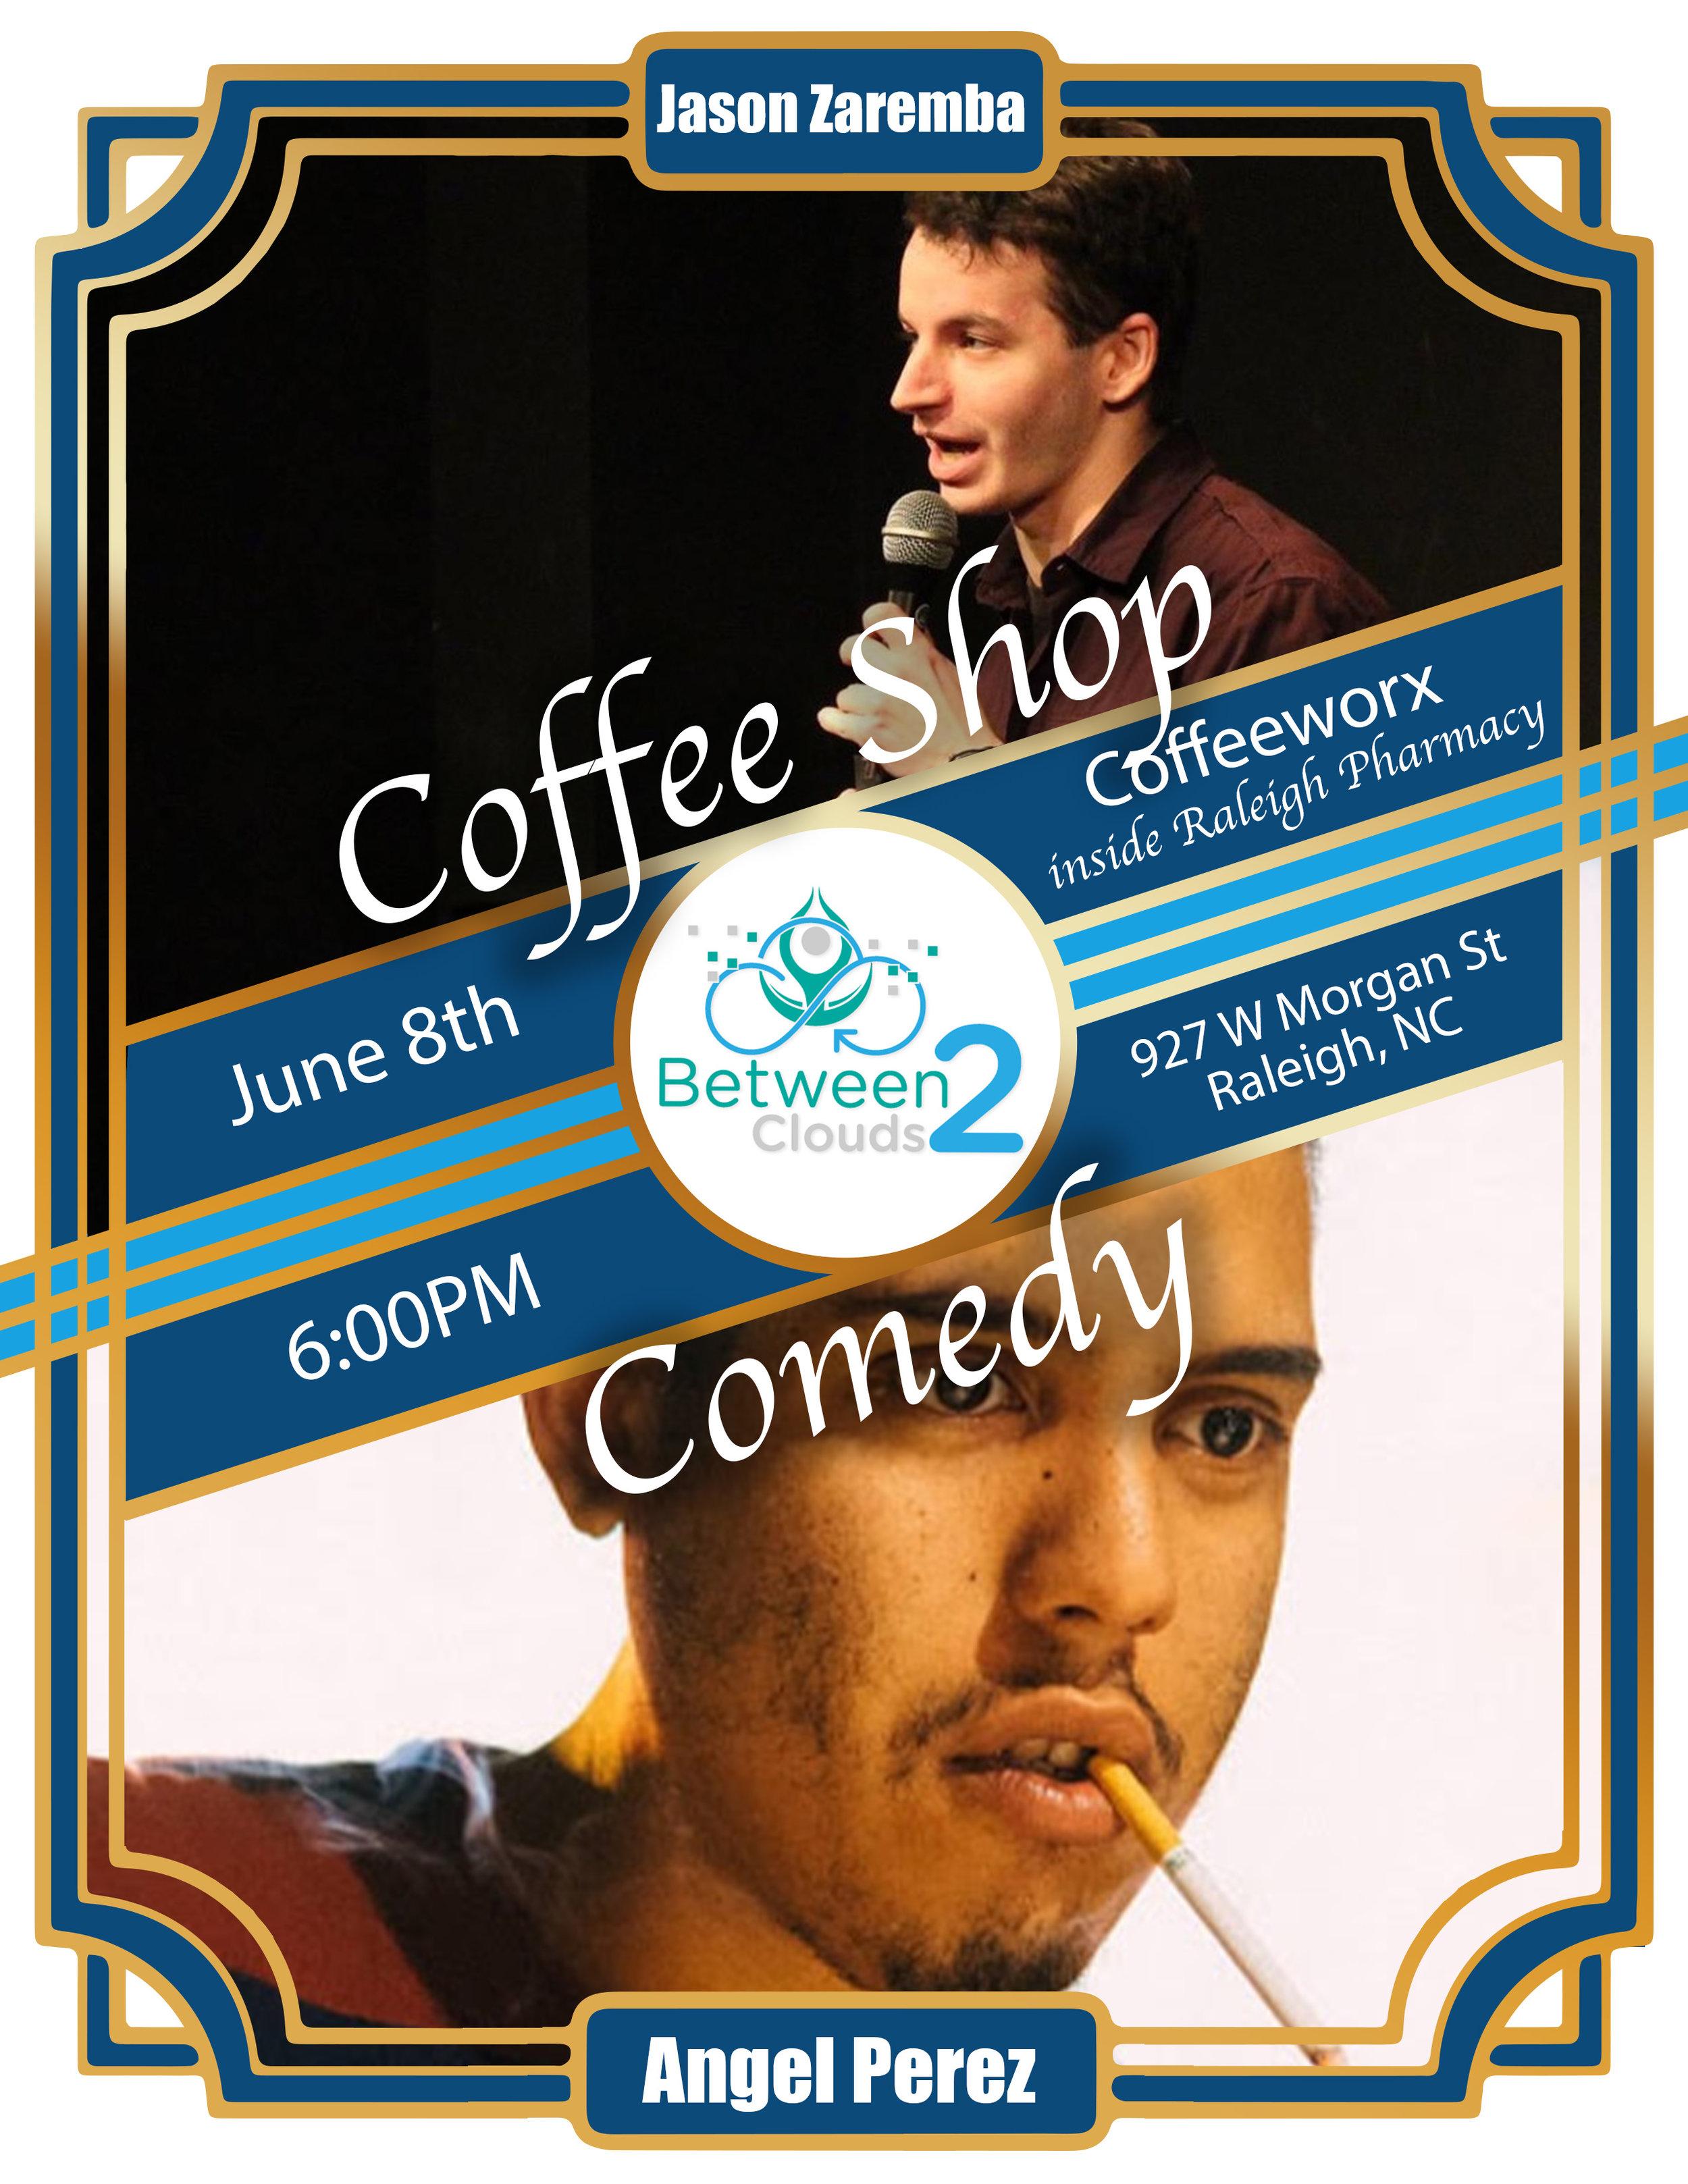 CoffeeCom6.8.2019coffeeworx.jpg